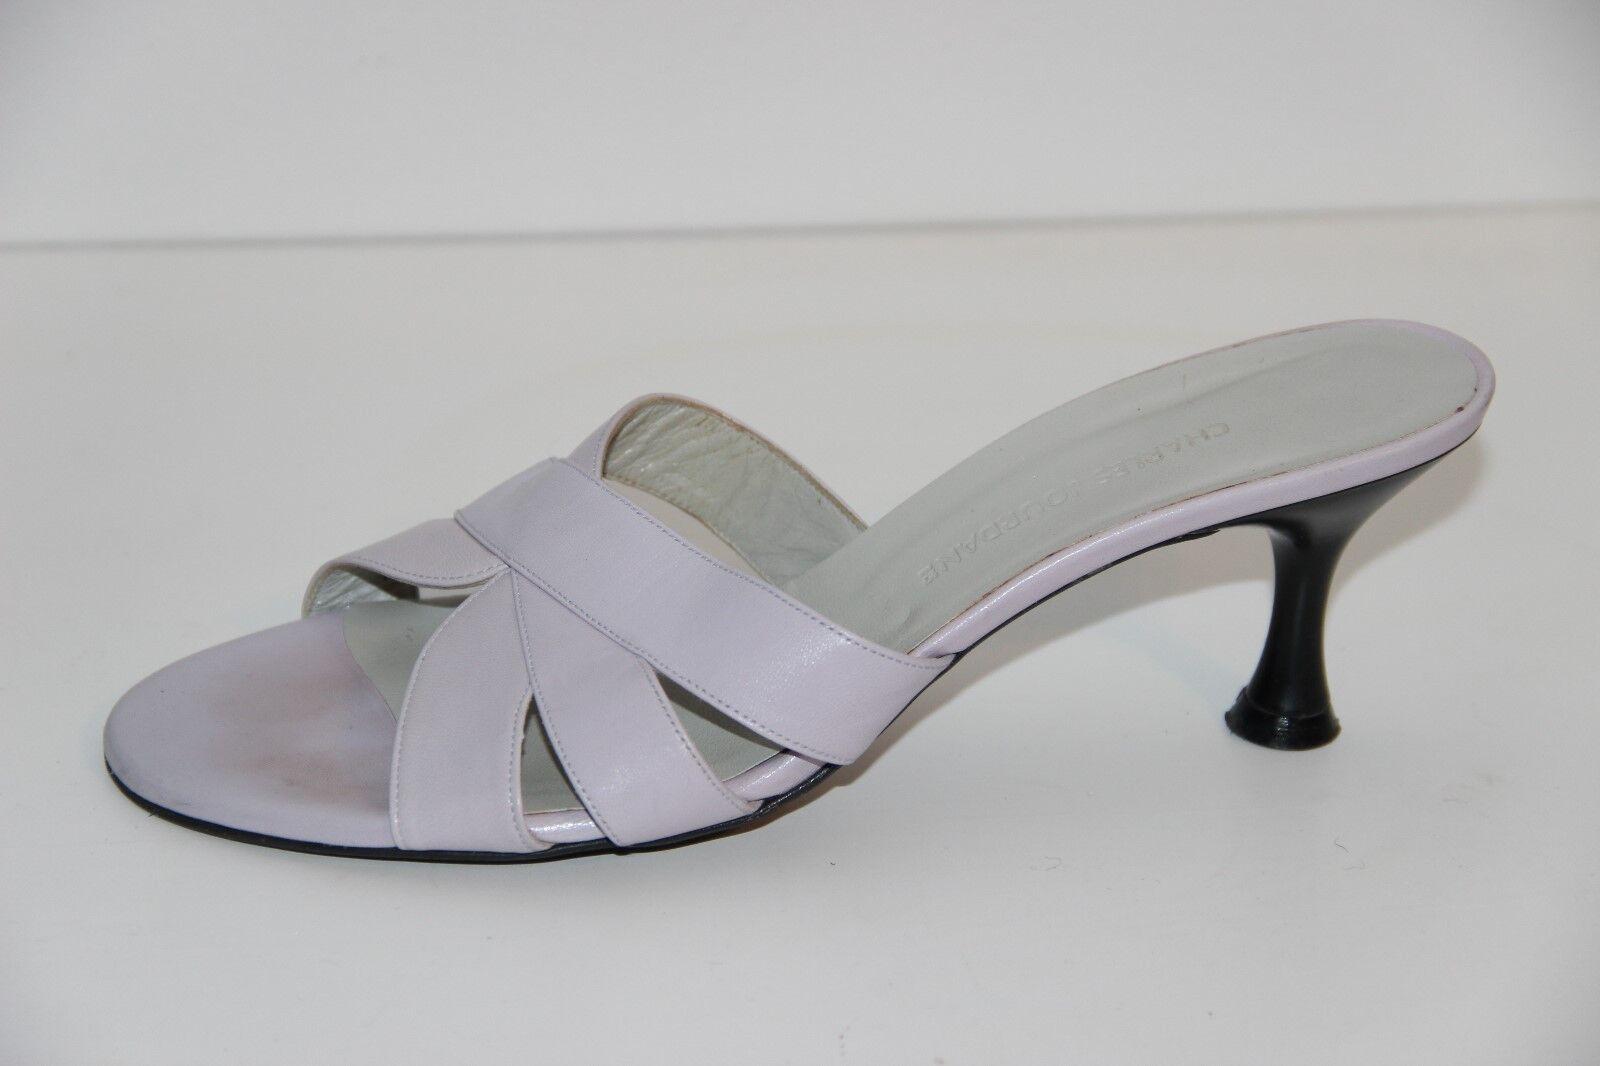 Sandalias sandalias pumps-púrpuras -    Charles Jourdan  - talla 39  online barato